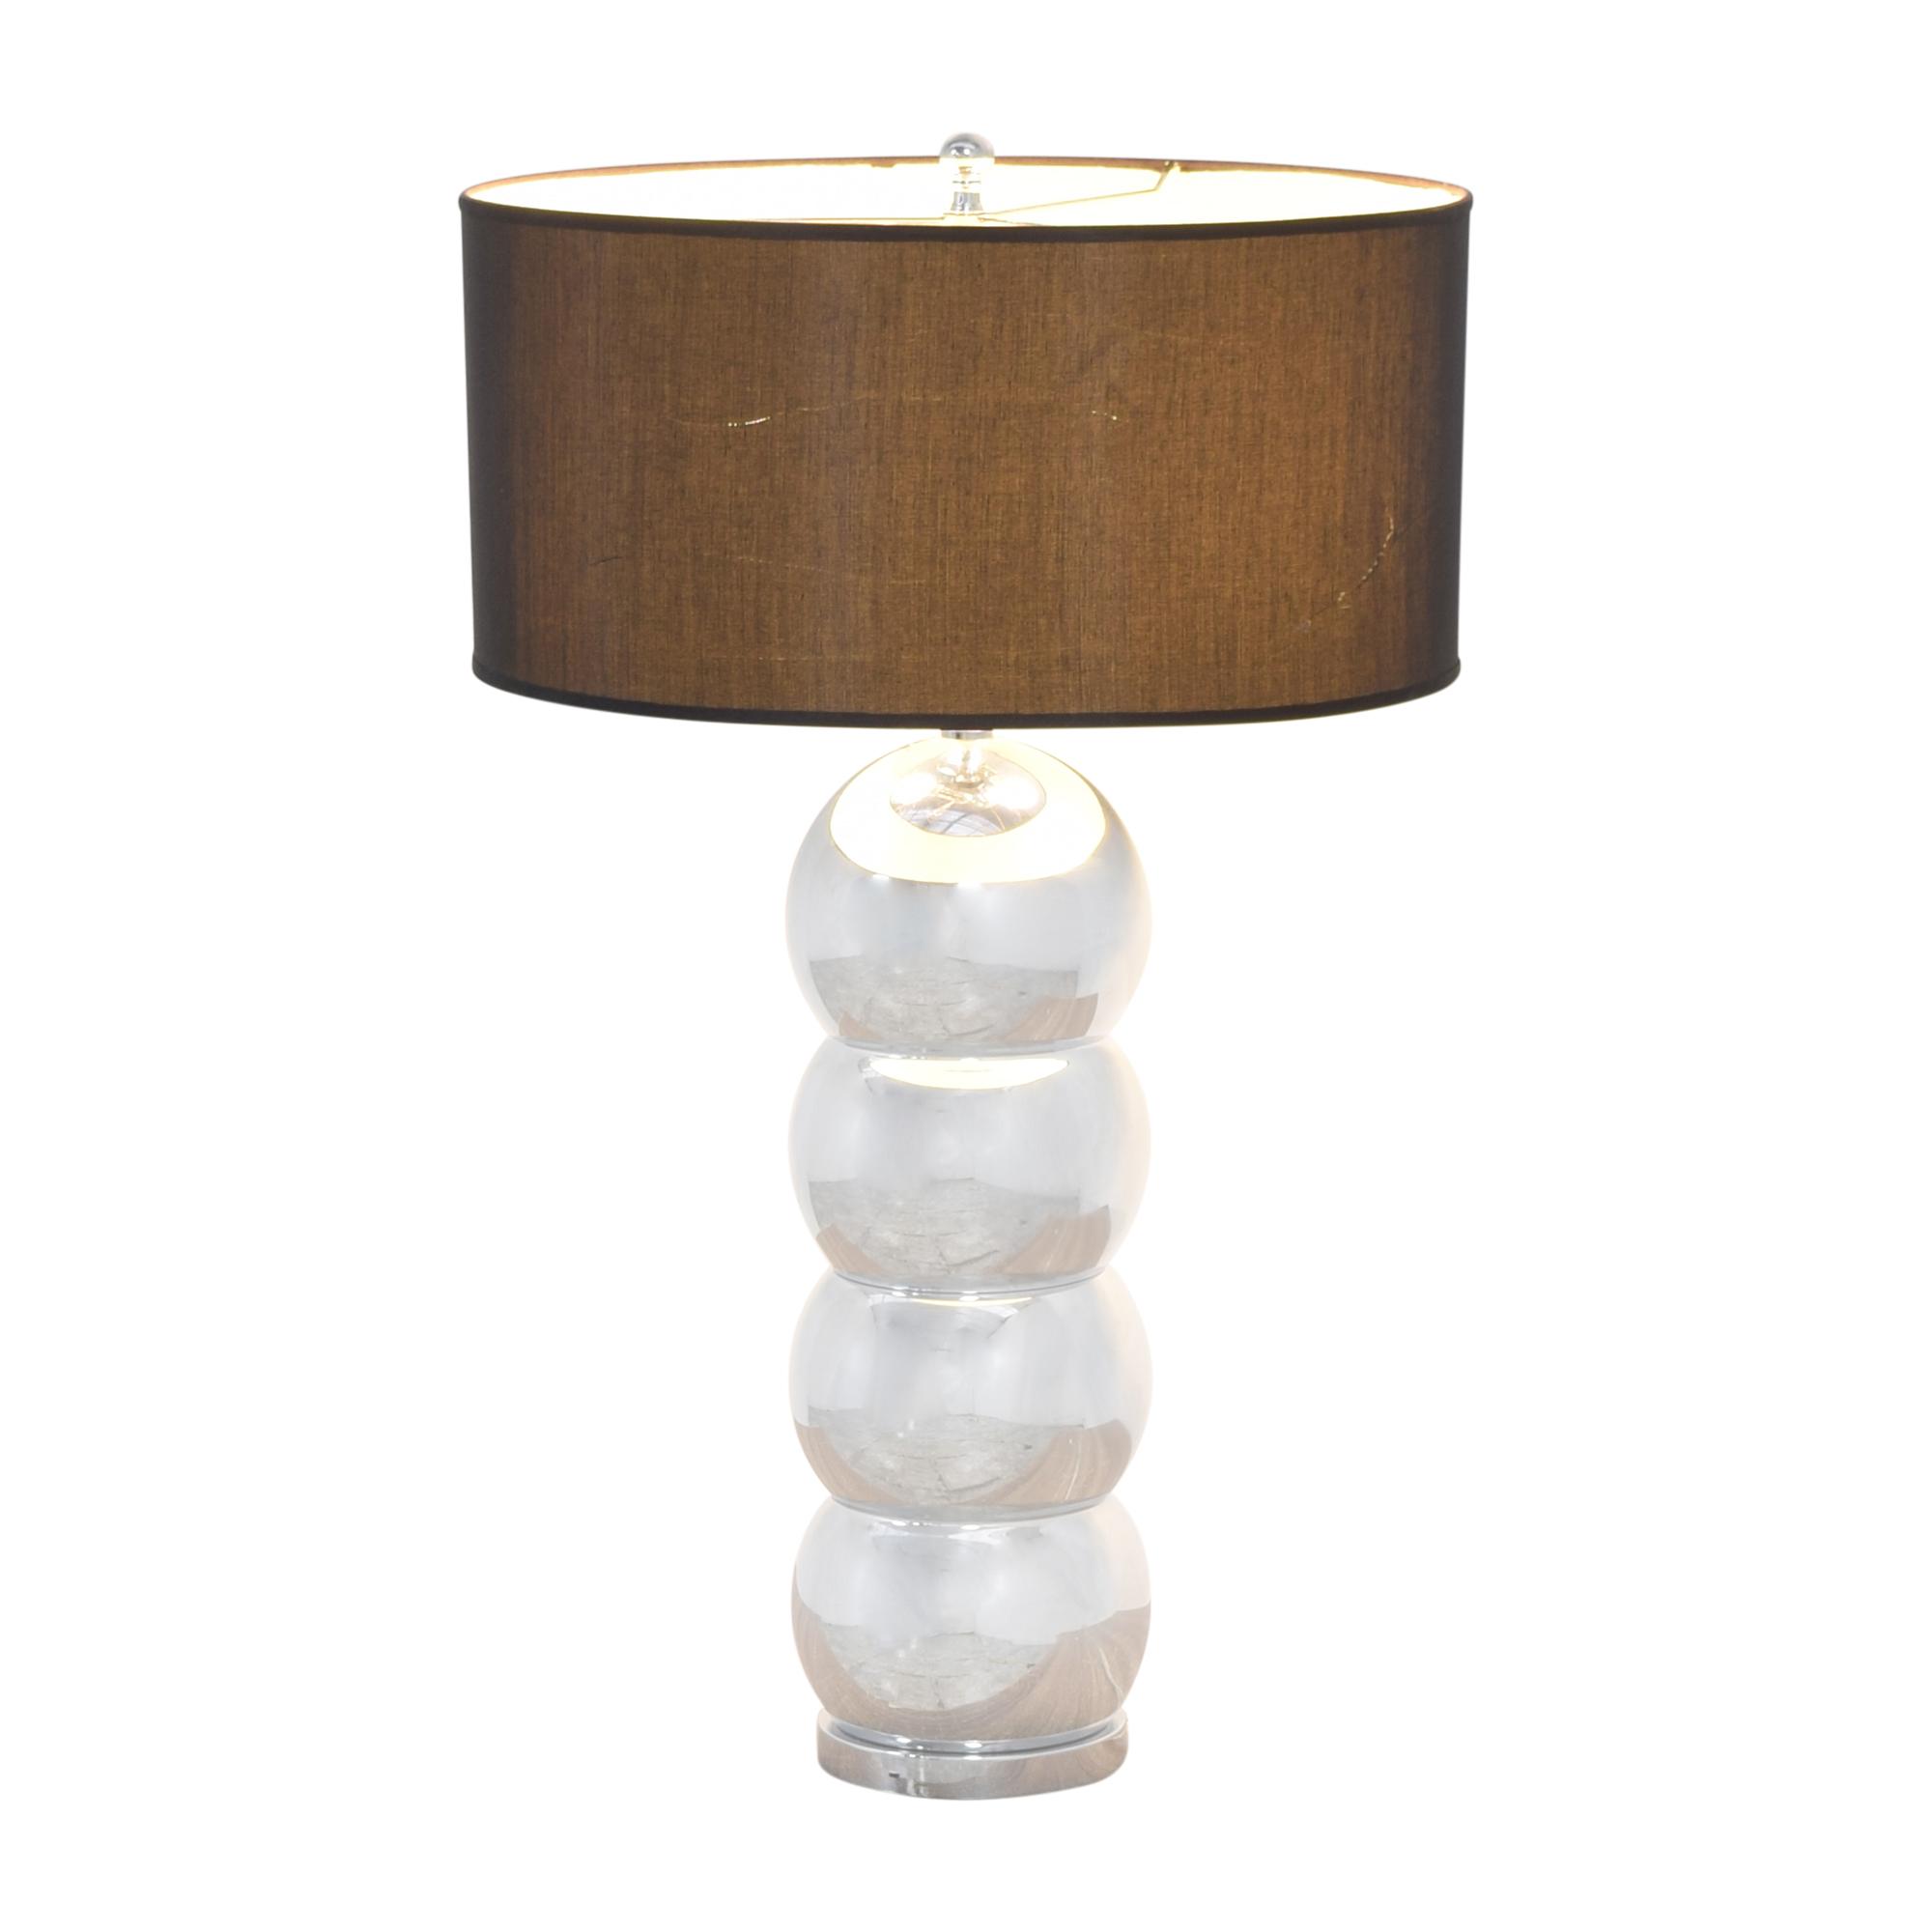 buy George Kovacs Stacked Ball Table Lamp George Kovacs Decor